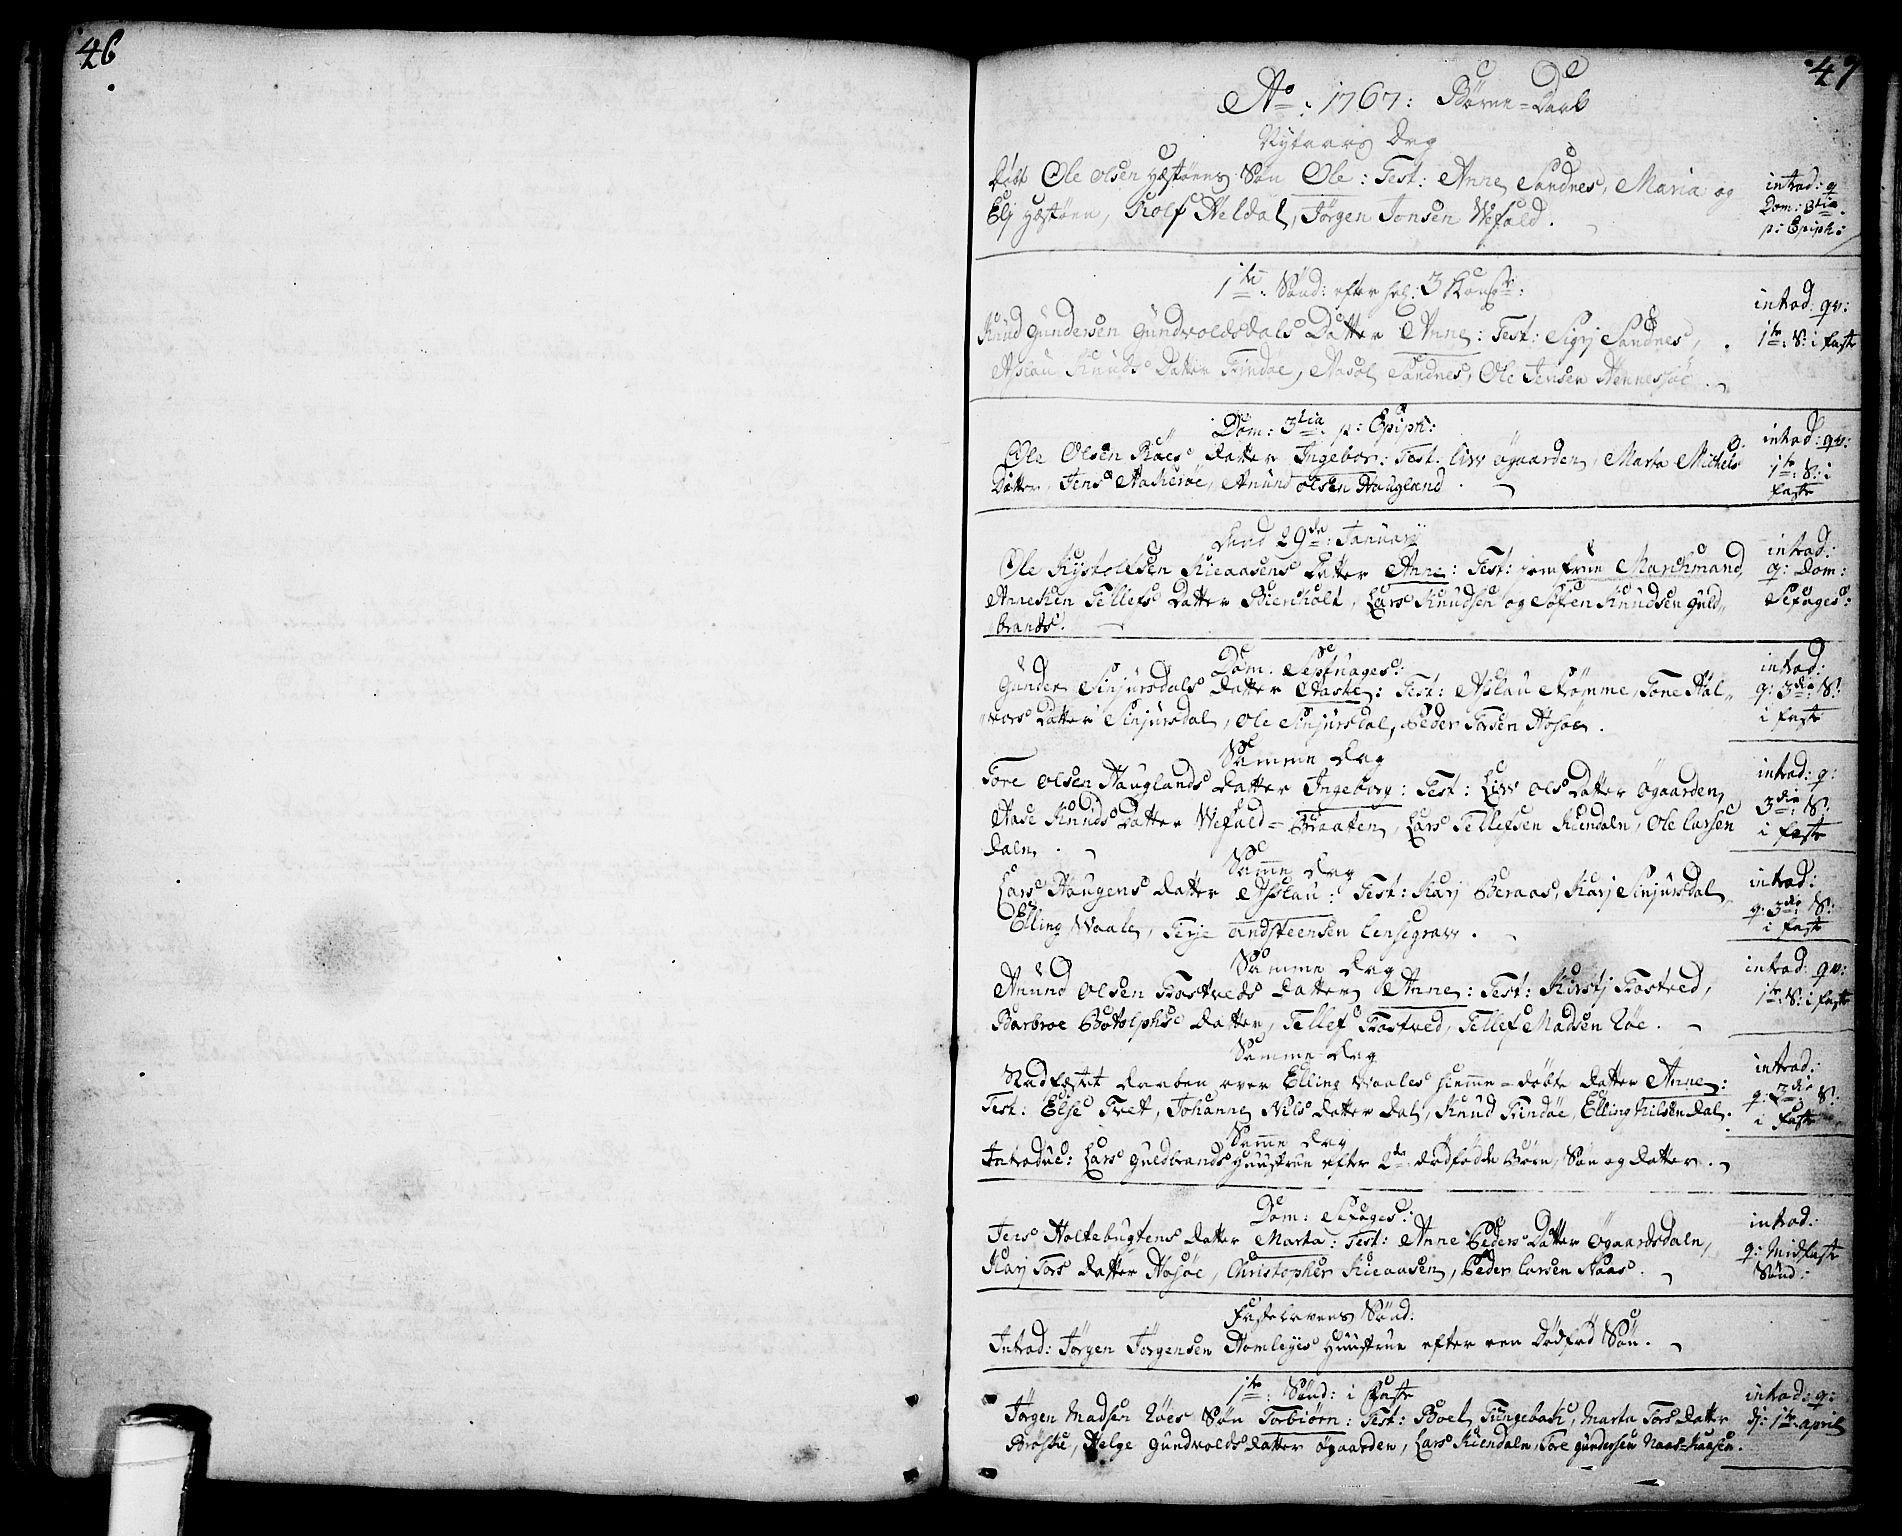 SAKO, Drangedal kirkebøker, F/Fa/L0001: Ministerialbok nr. 1, 1697-1767, s. 46-47